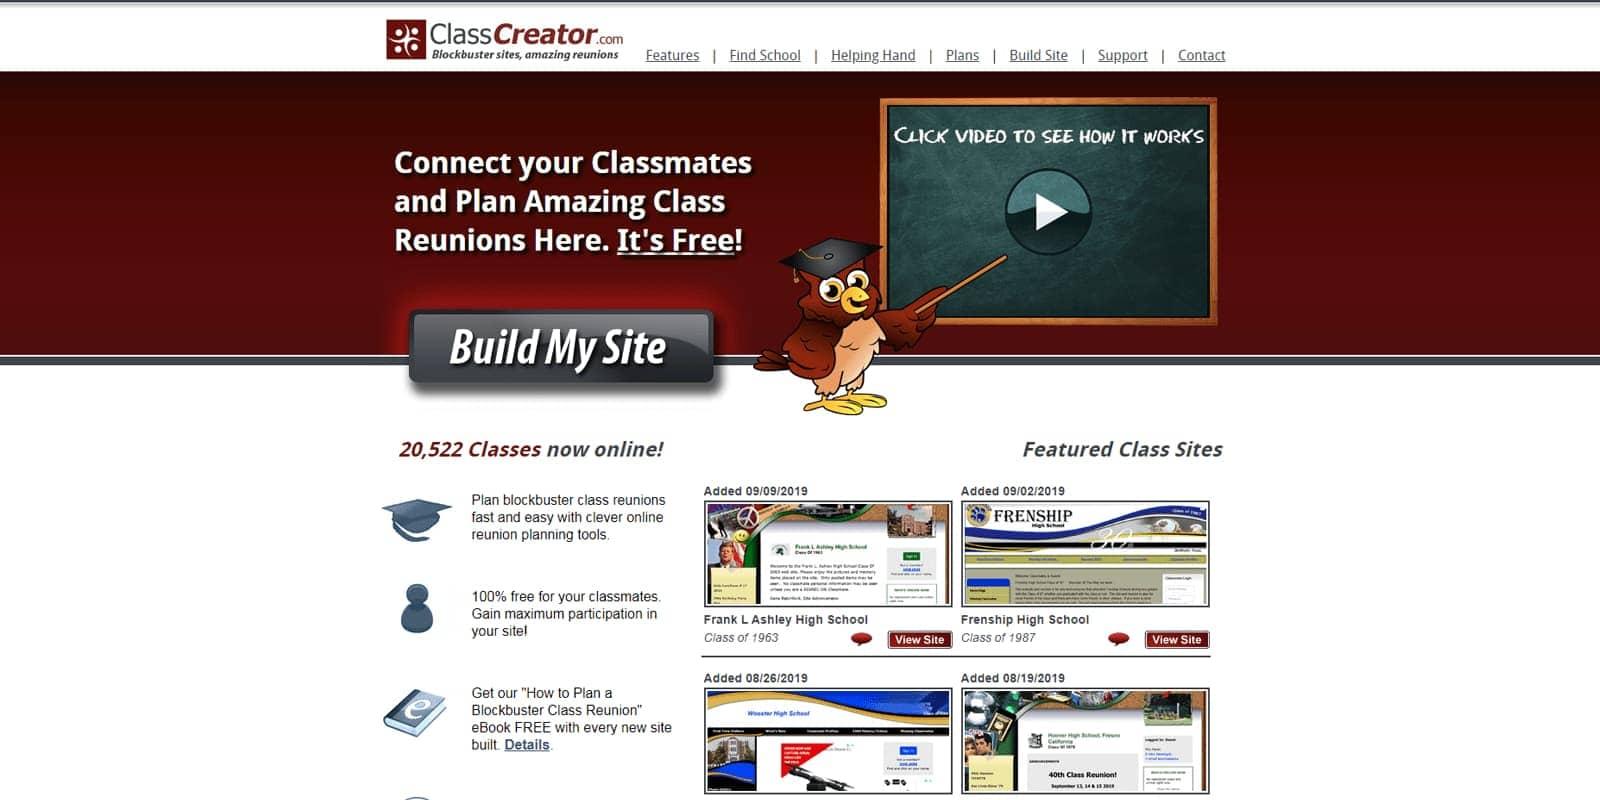 Classcreator